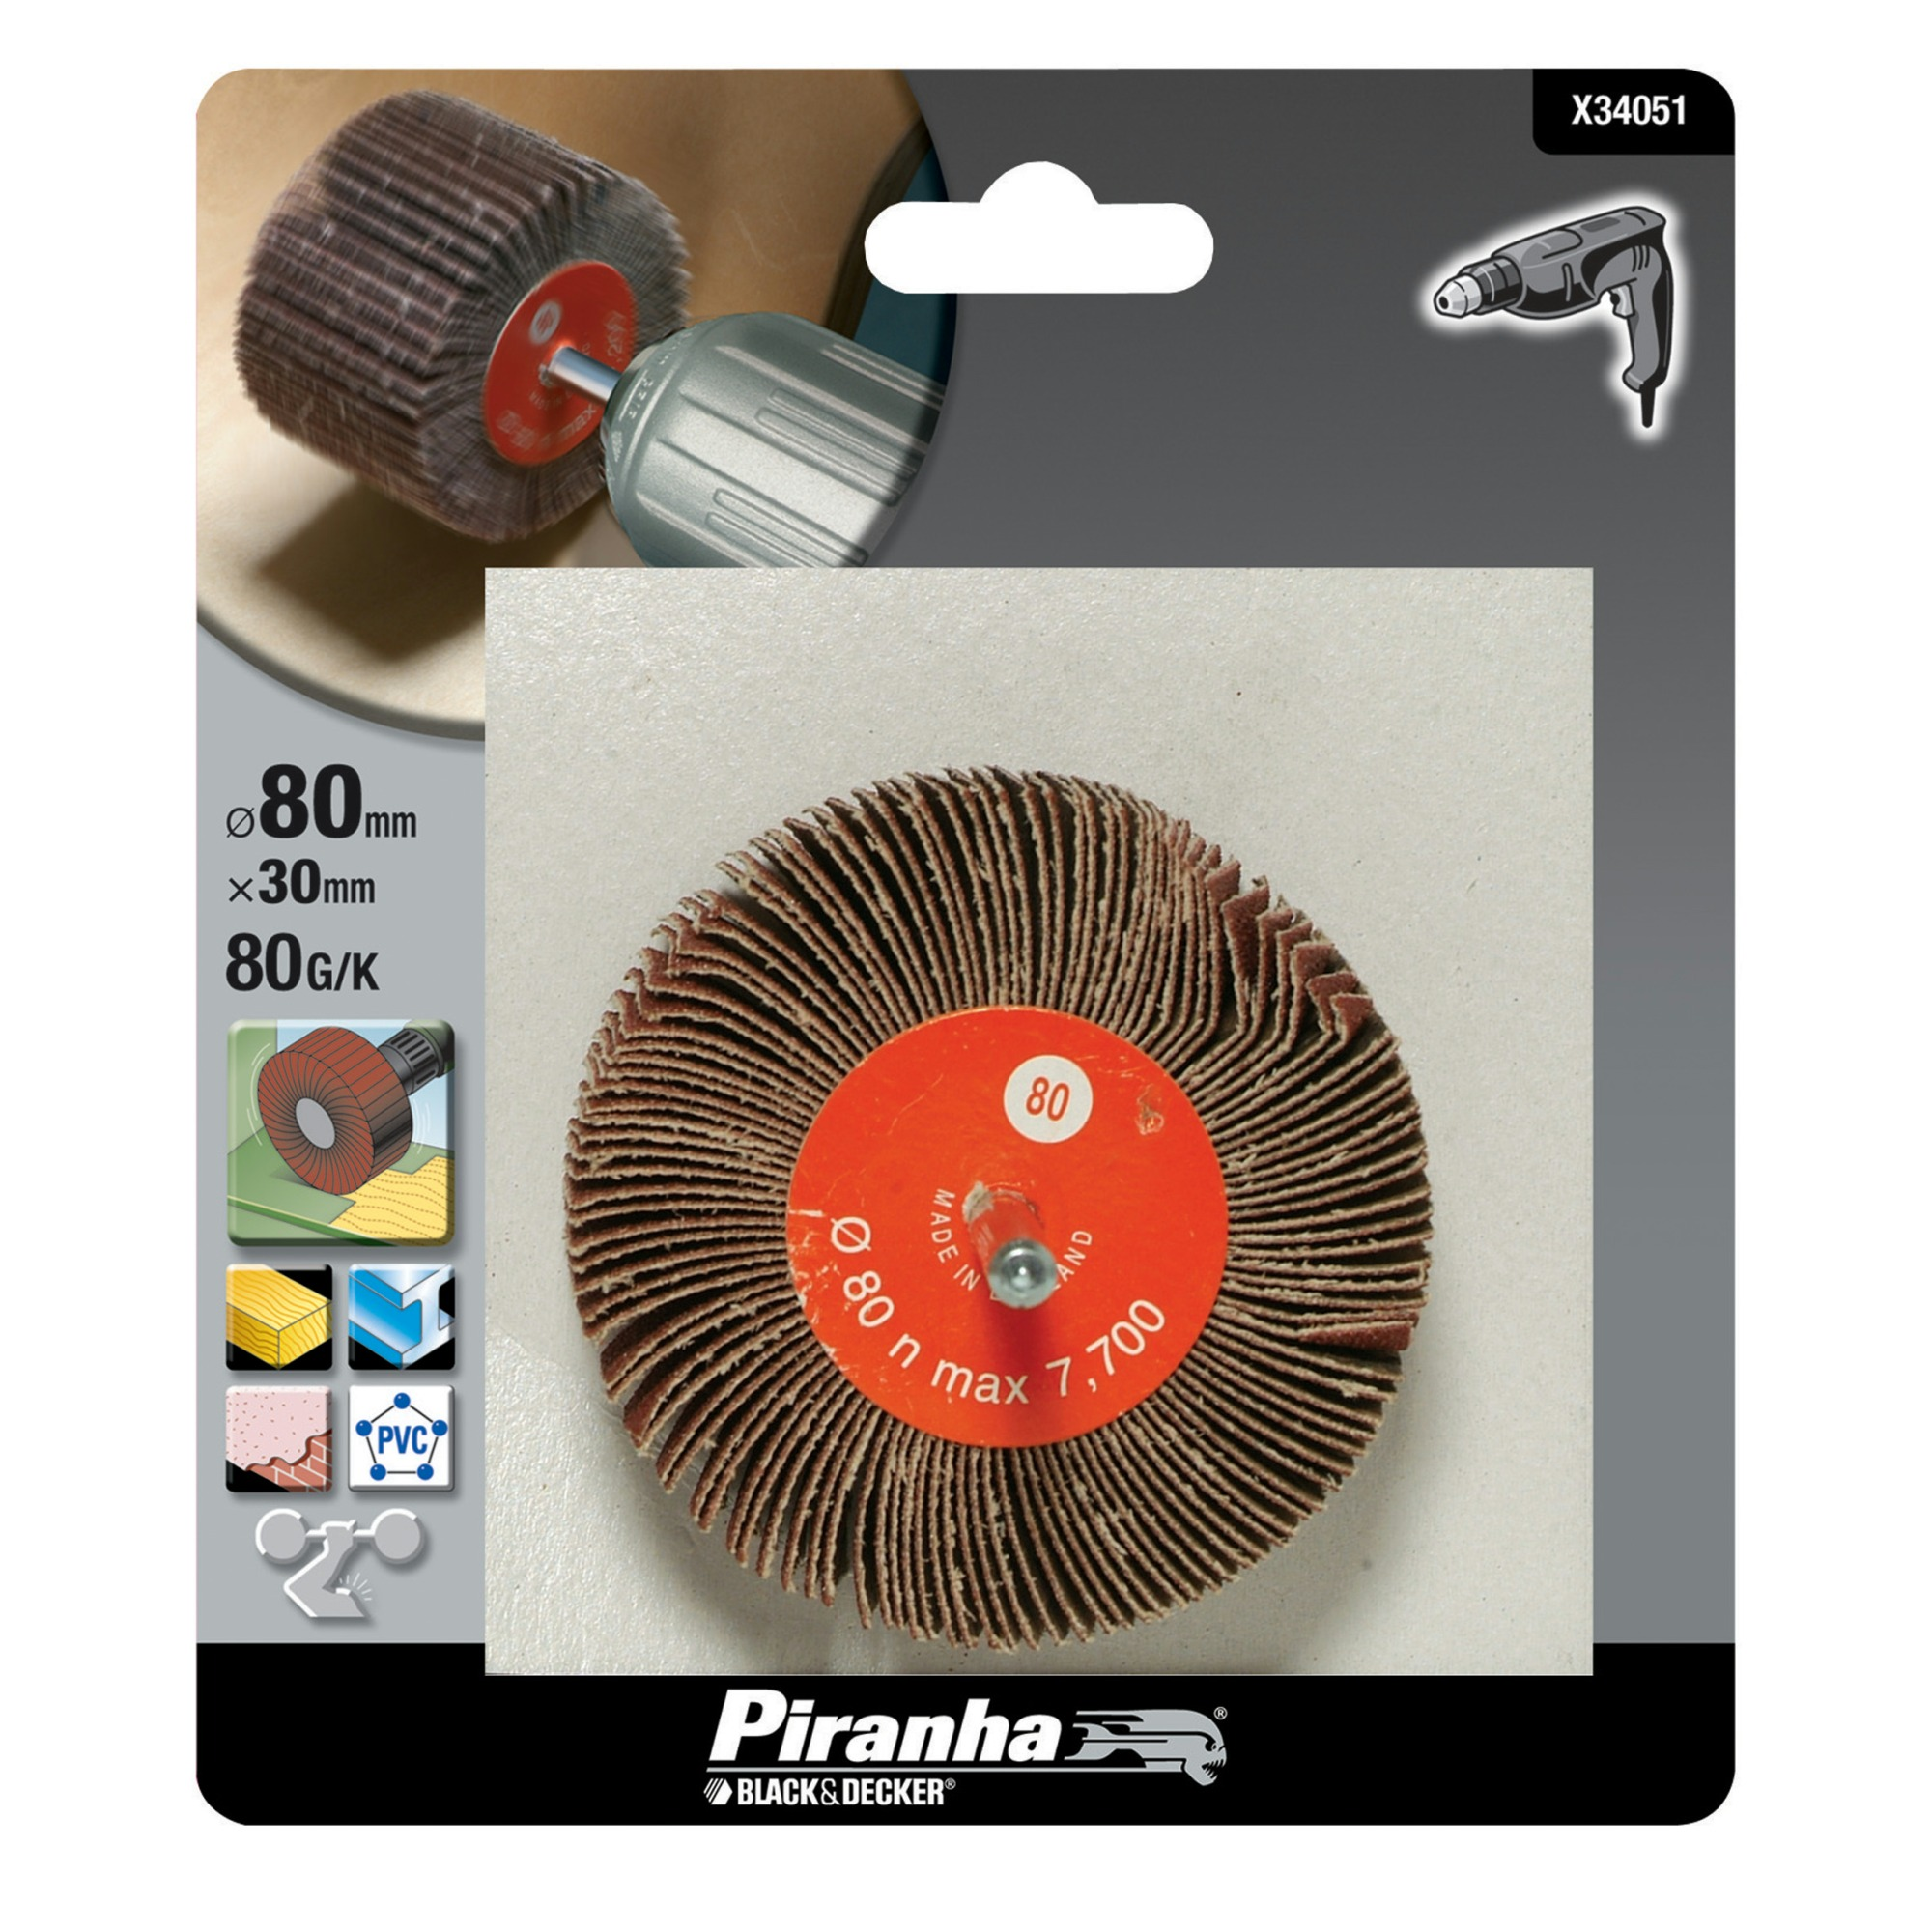 Piranha lamelschuurwiel X34051 K80 80 mm